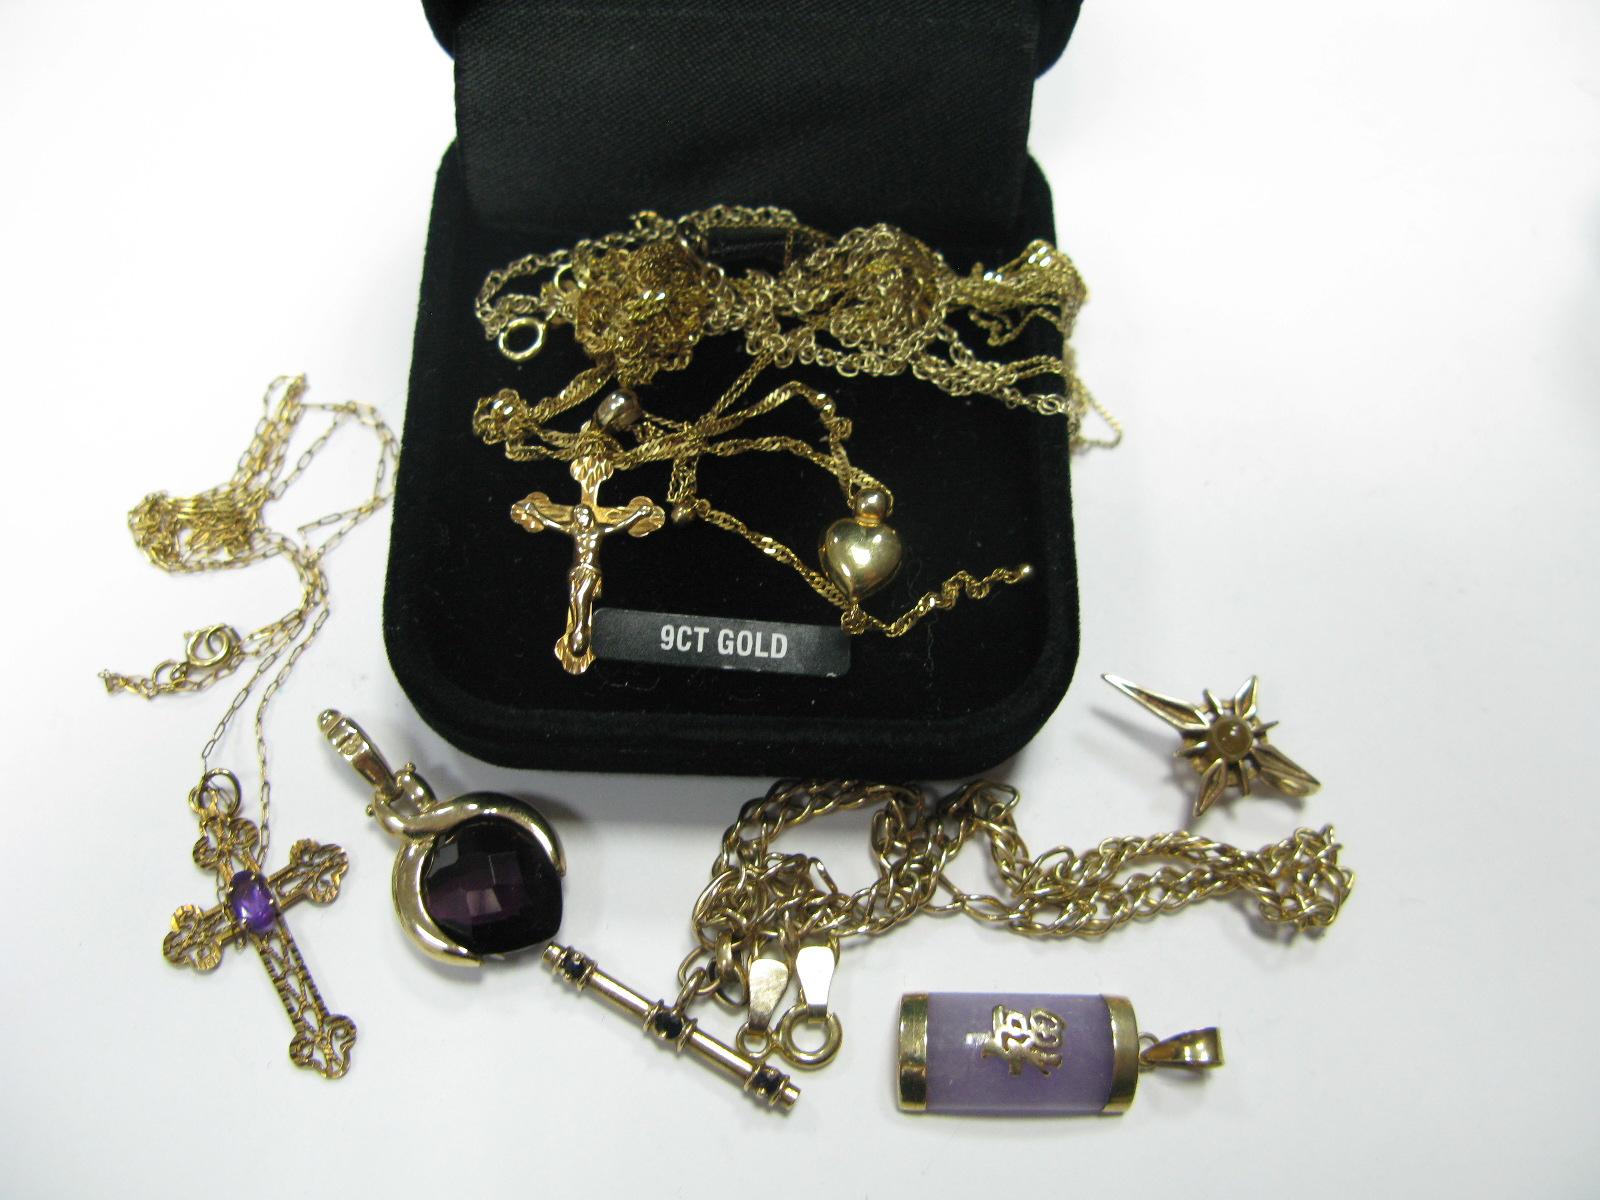 Lot 1368 - A 9ct Gold Flat Link Bracelet, with sliding T-bar pendant, three stone set pendants of various